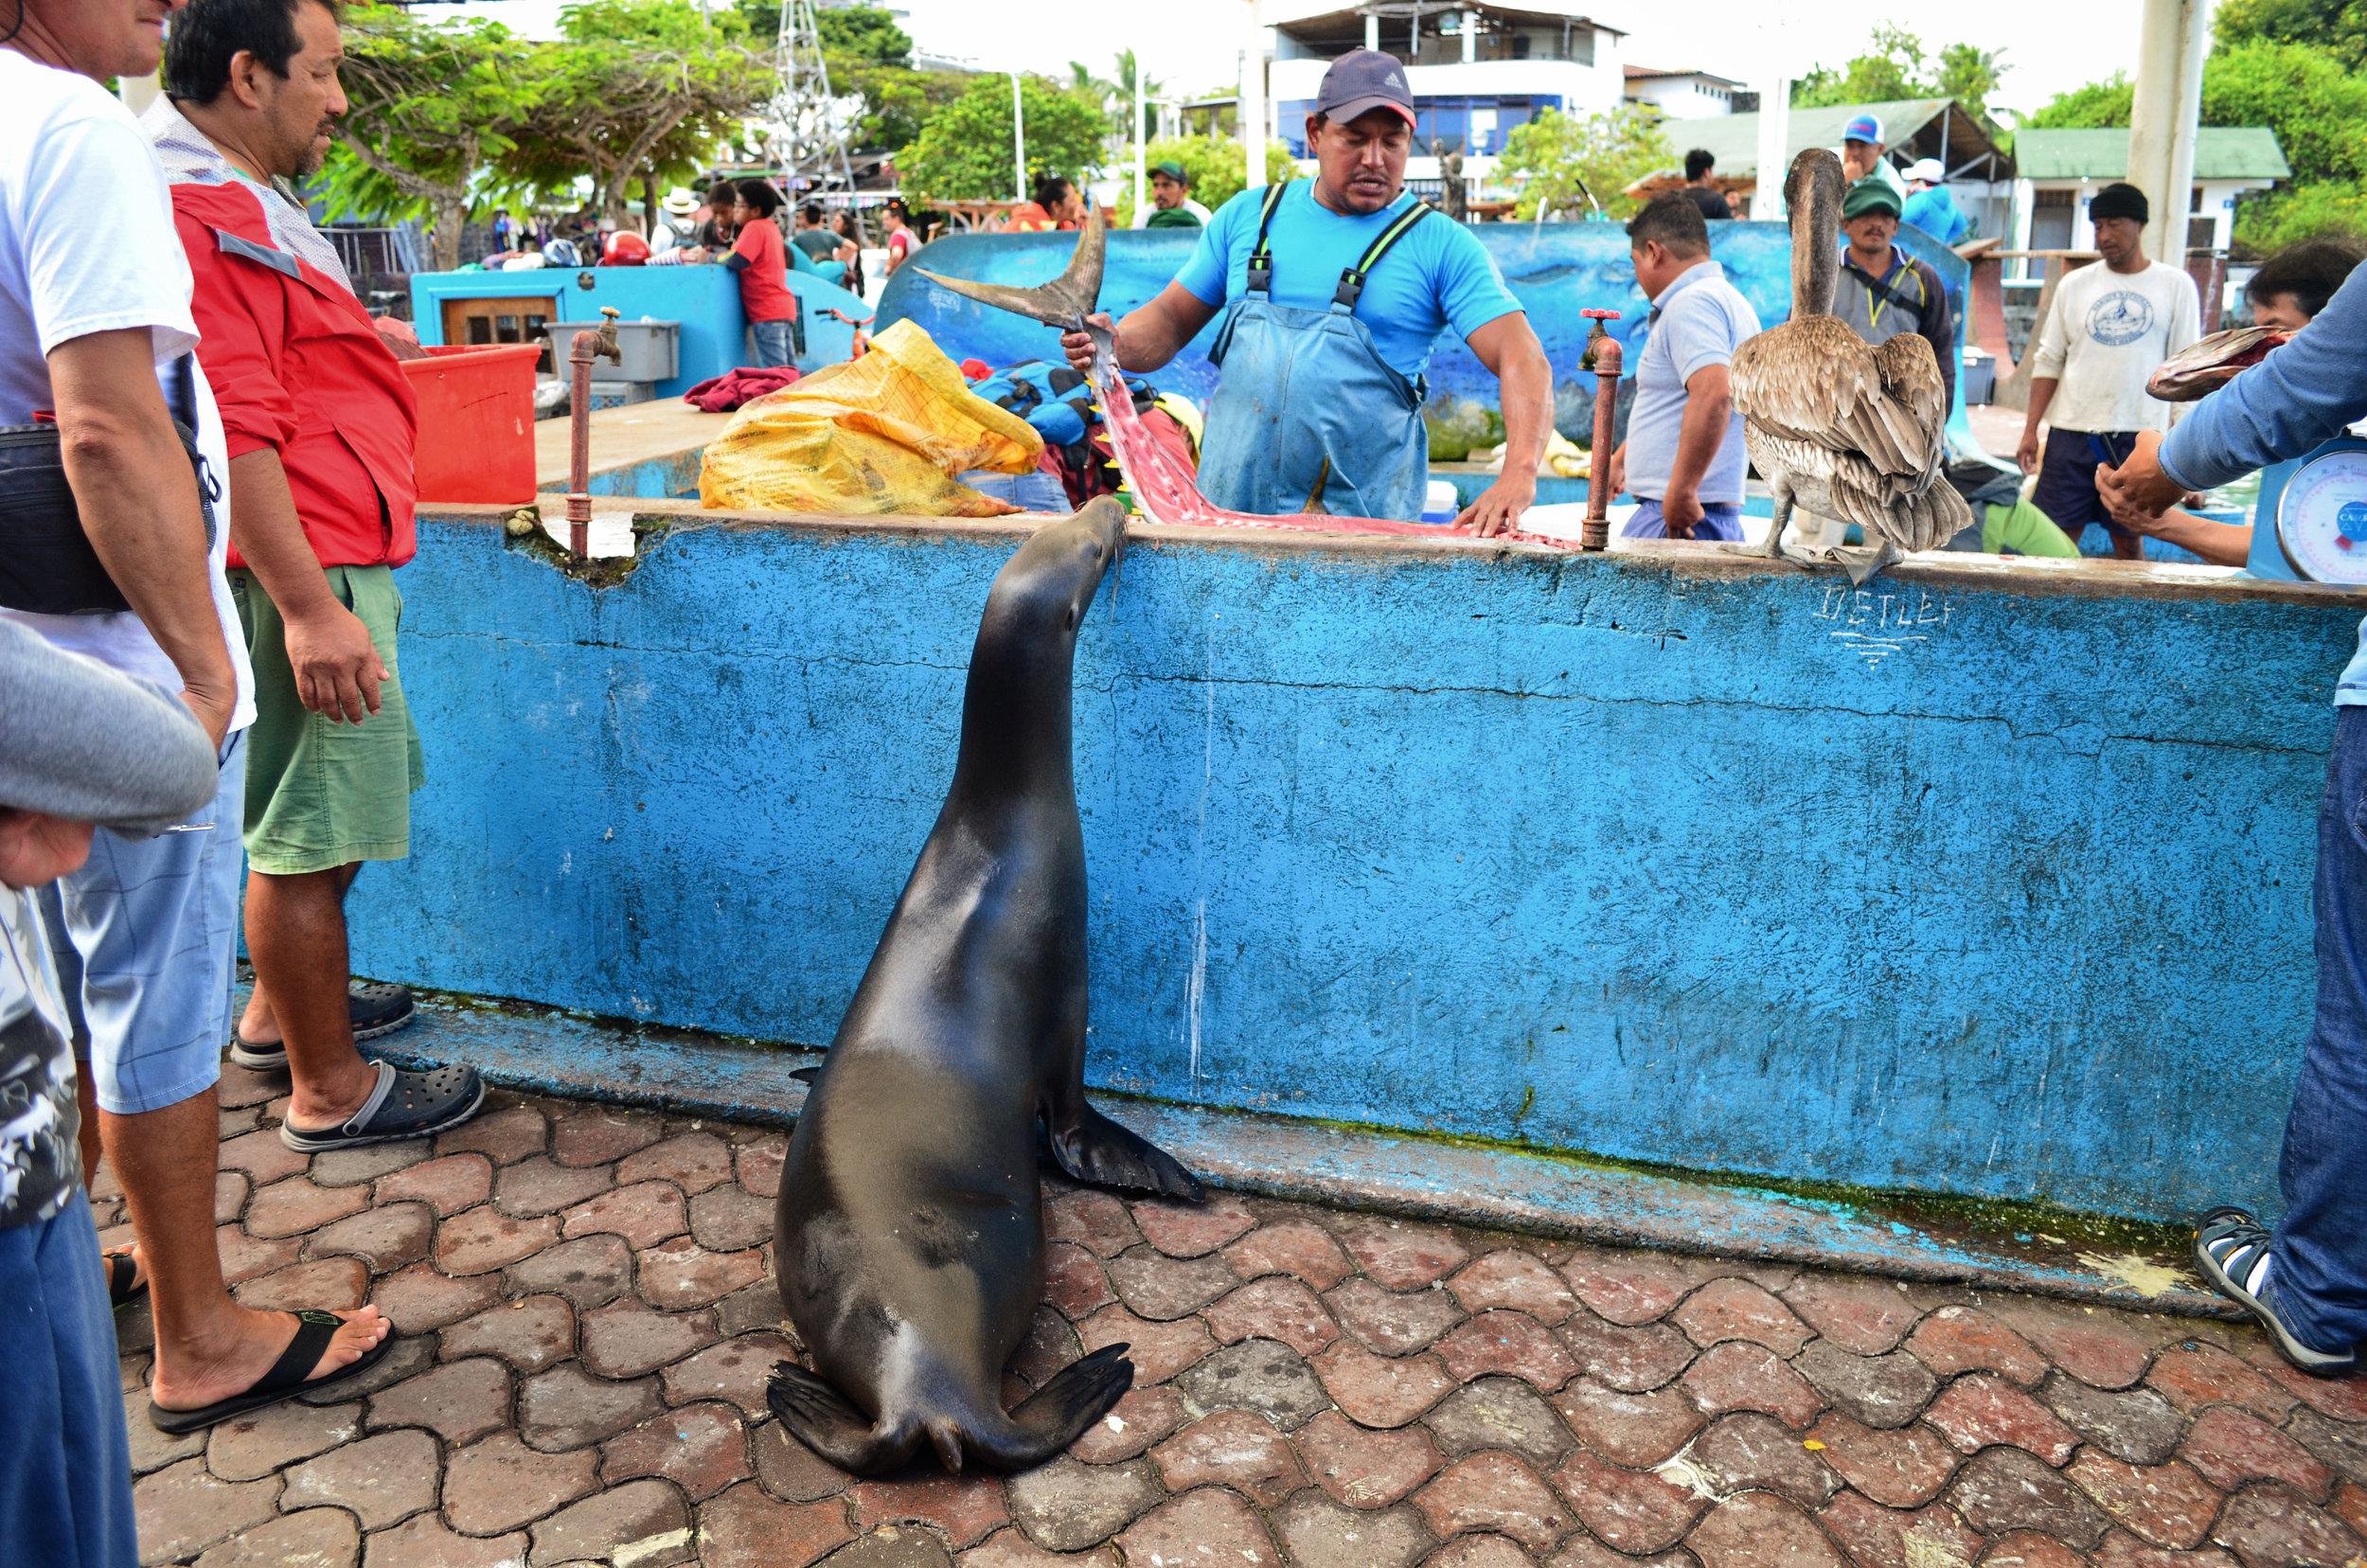 A wishful sea lion waits for fresh fish at the pier on Santa Cruz Island